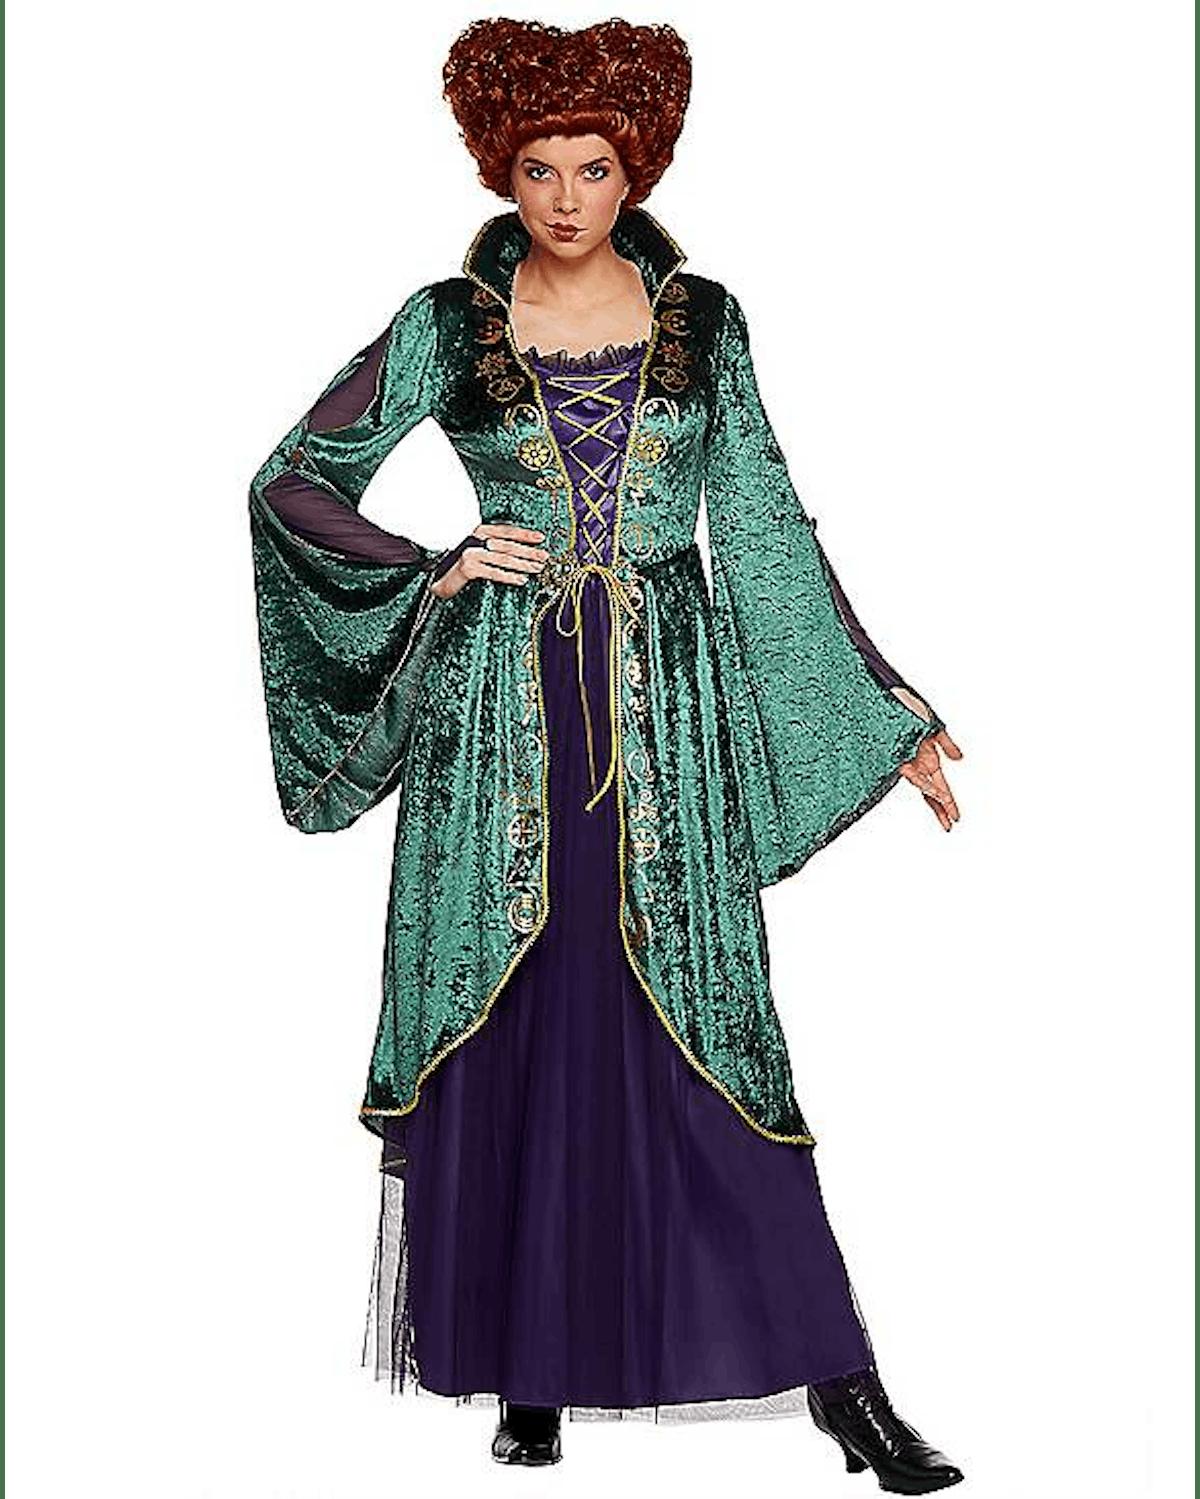 Spirit Halloween Adult Winifred Sanderson Costume